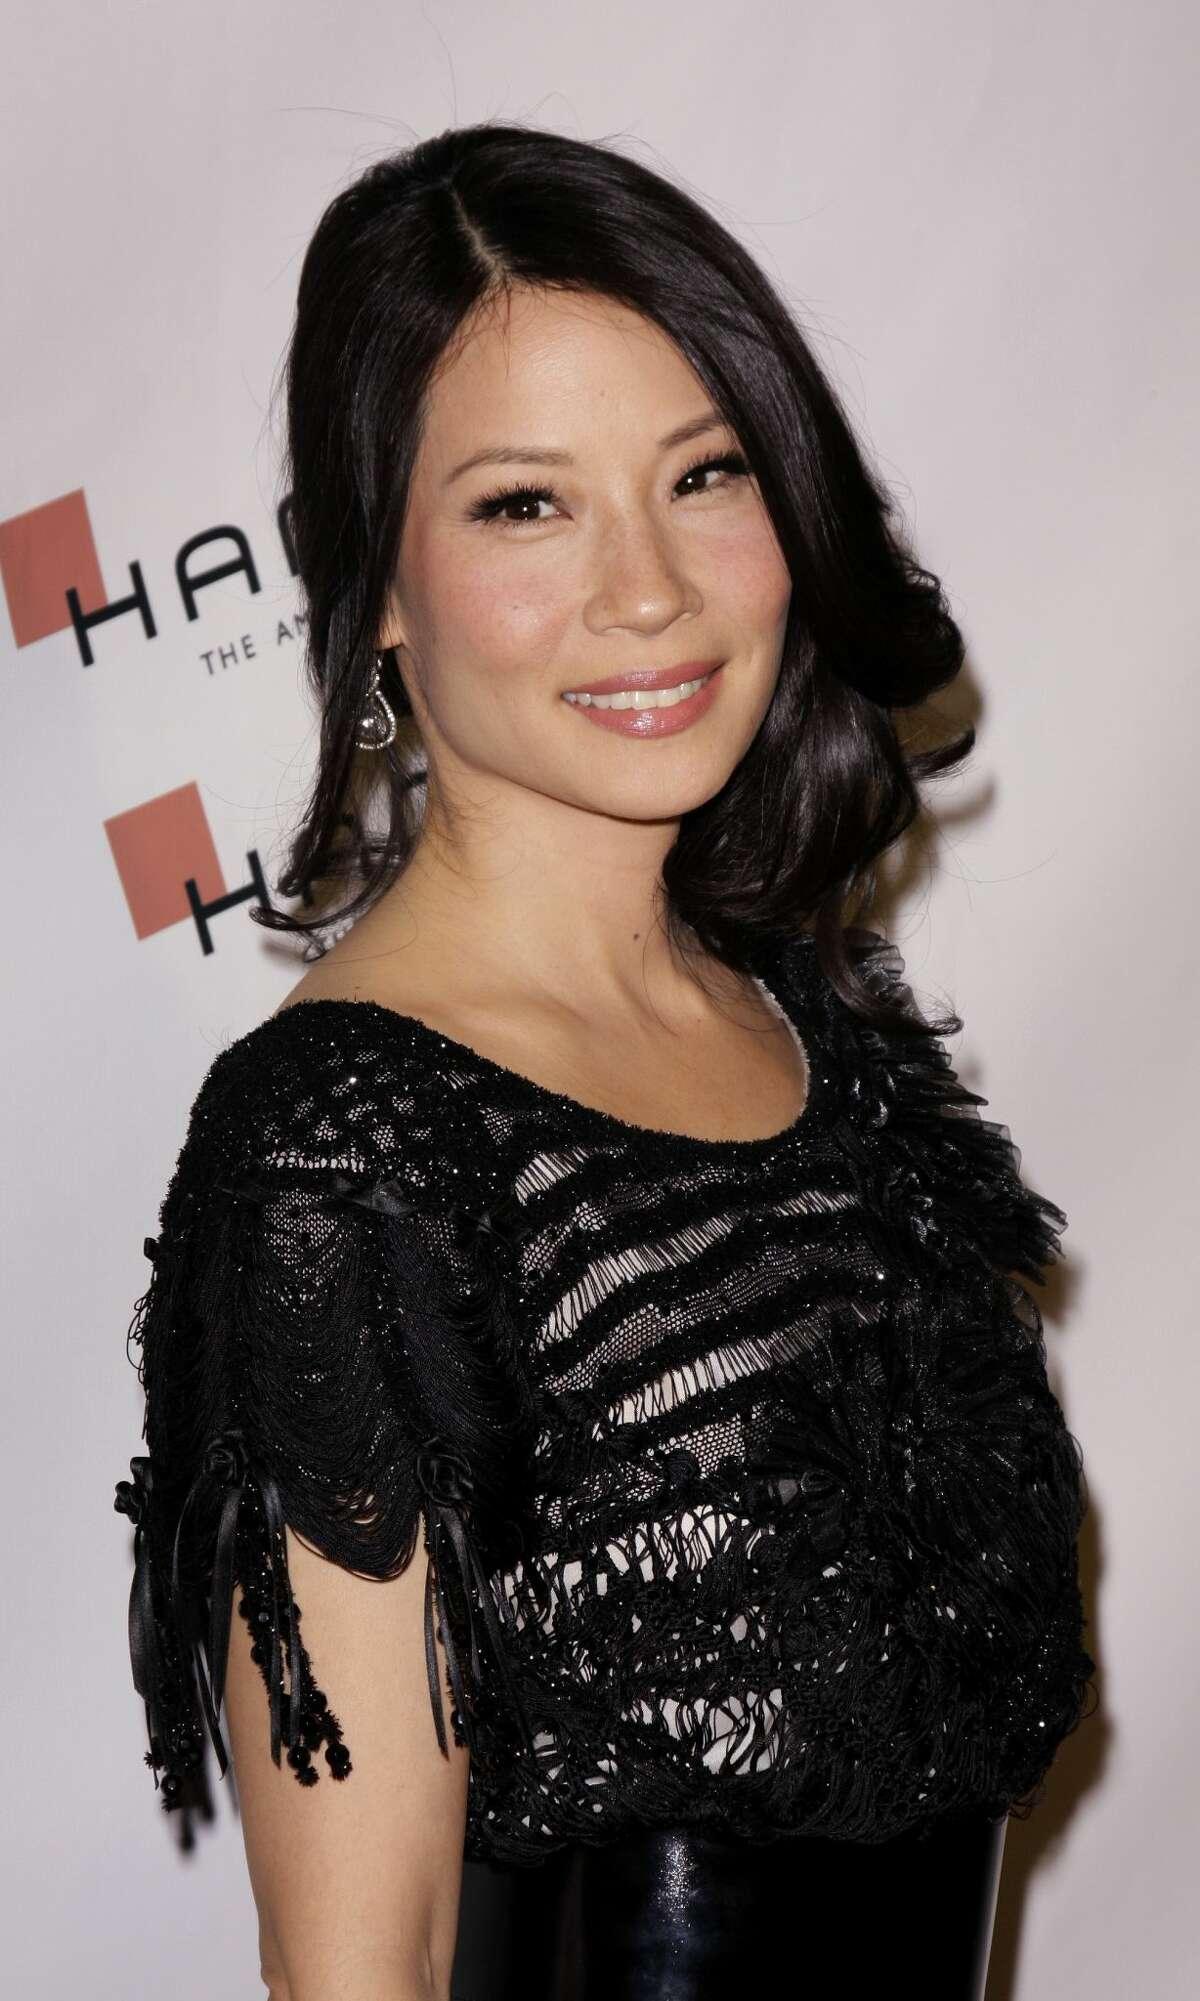 Clue: Liu arrives at the Hamilton and Hollywood Life Magazine - Behind The Camera Awards.